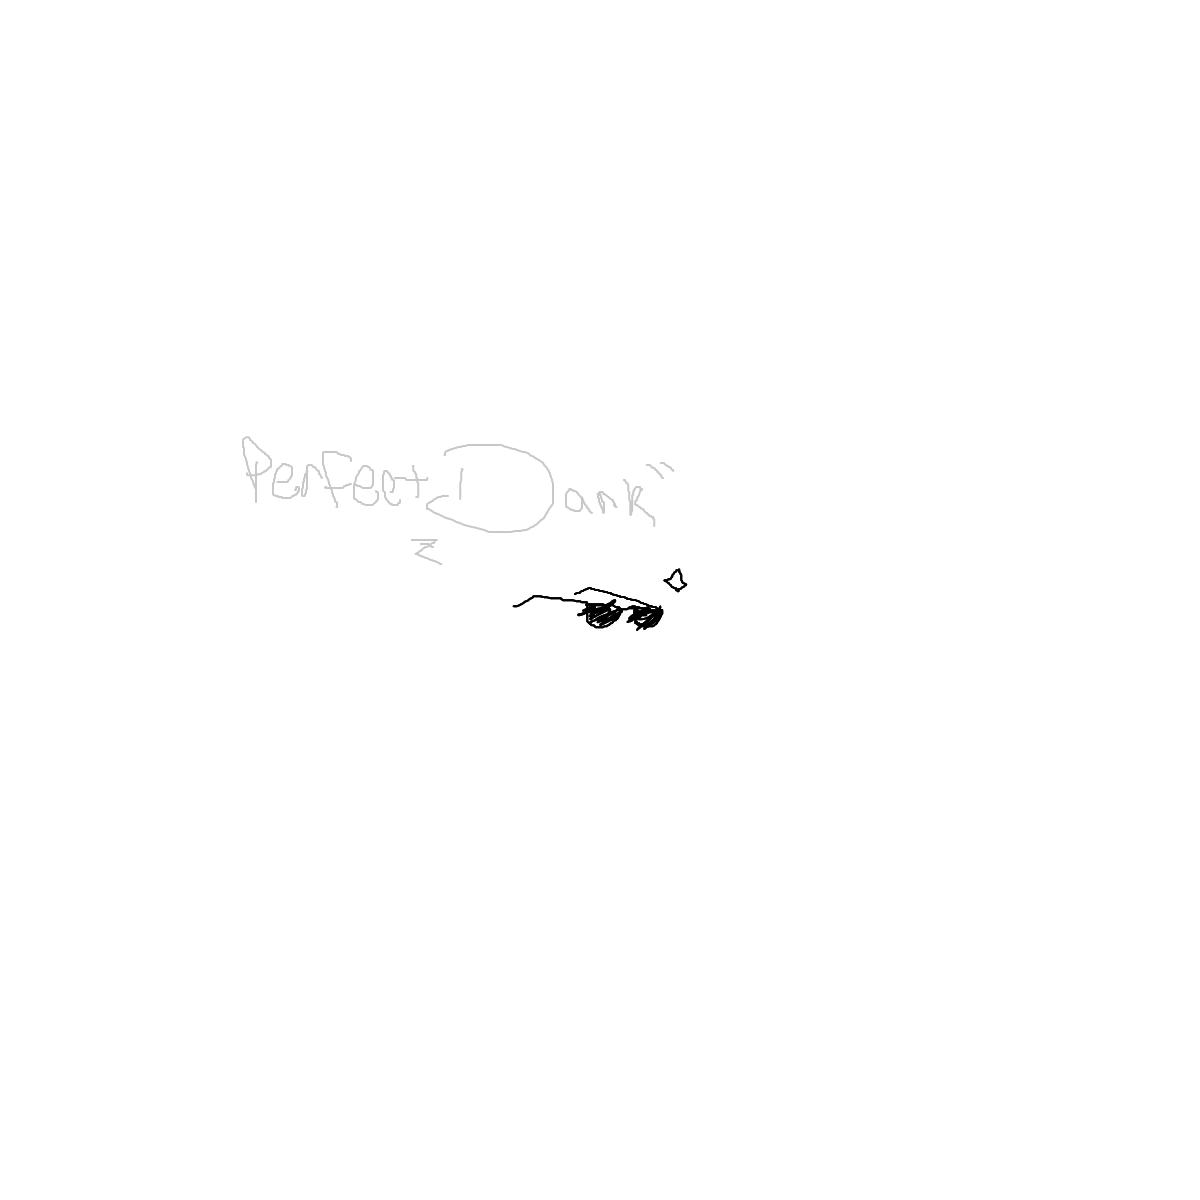 BAAAM drawing#23253 lat:45.5245704650878900lng: -122.8057937622070300